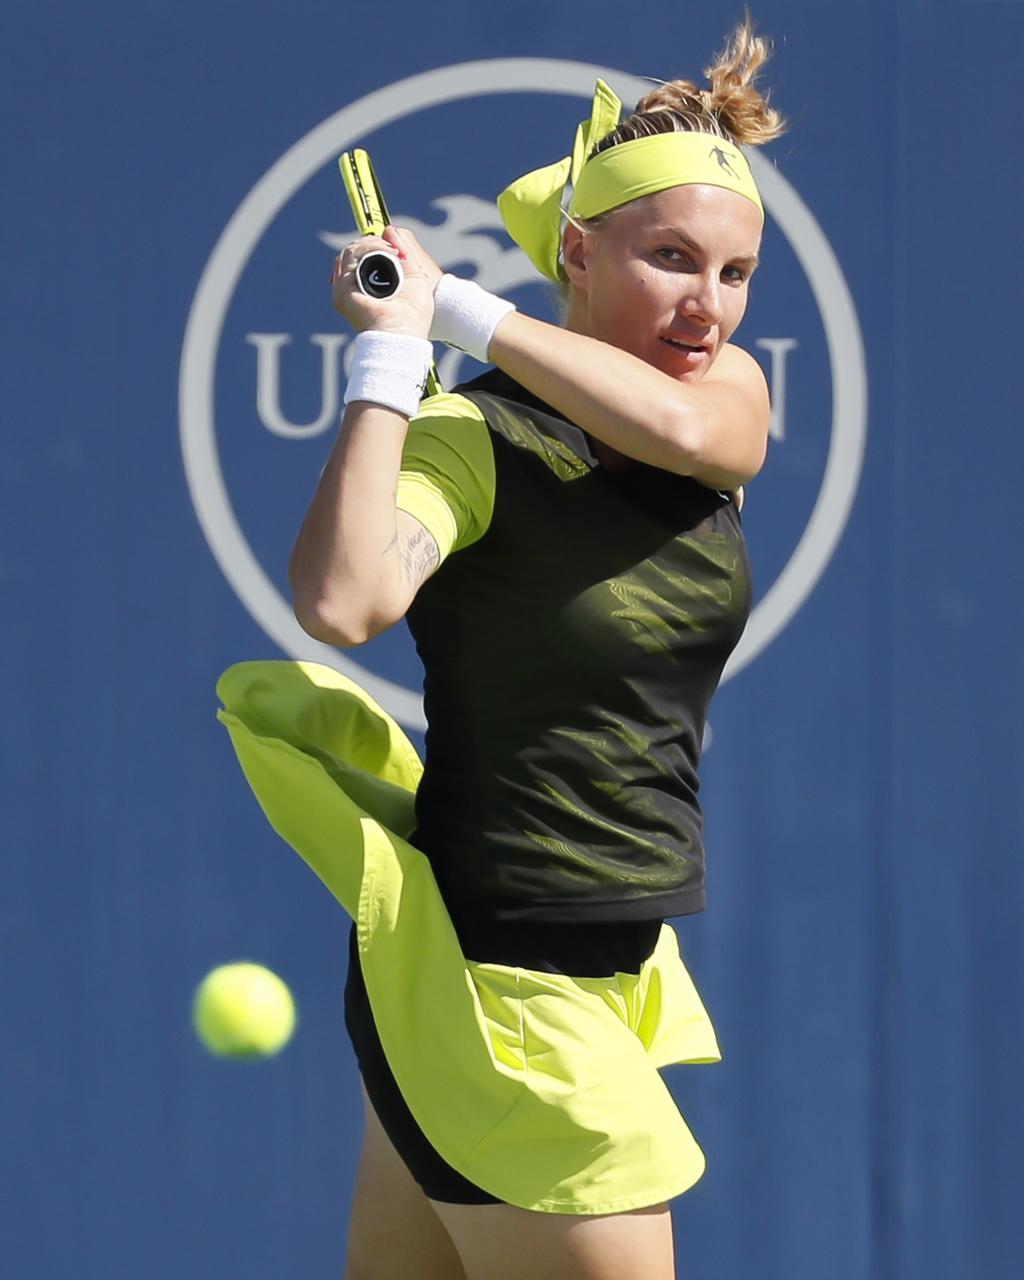 Muguruza outlasts Kuznetsova to reach Cincinnati semifinal